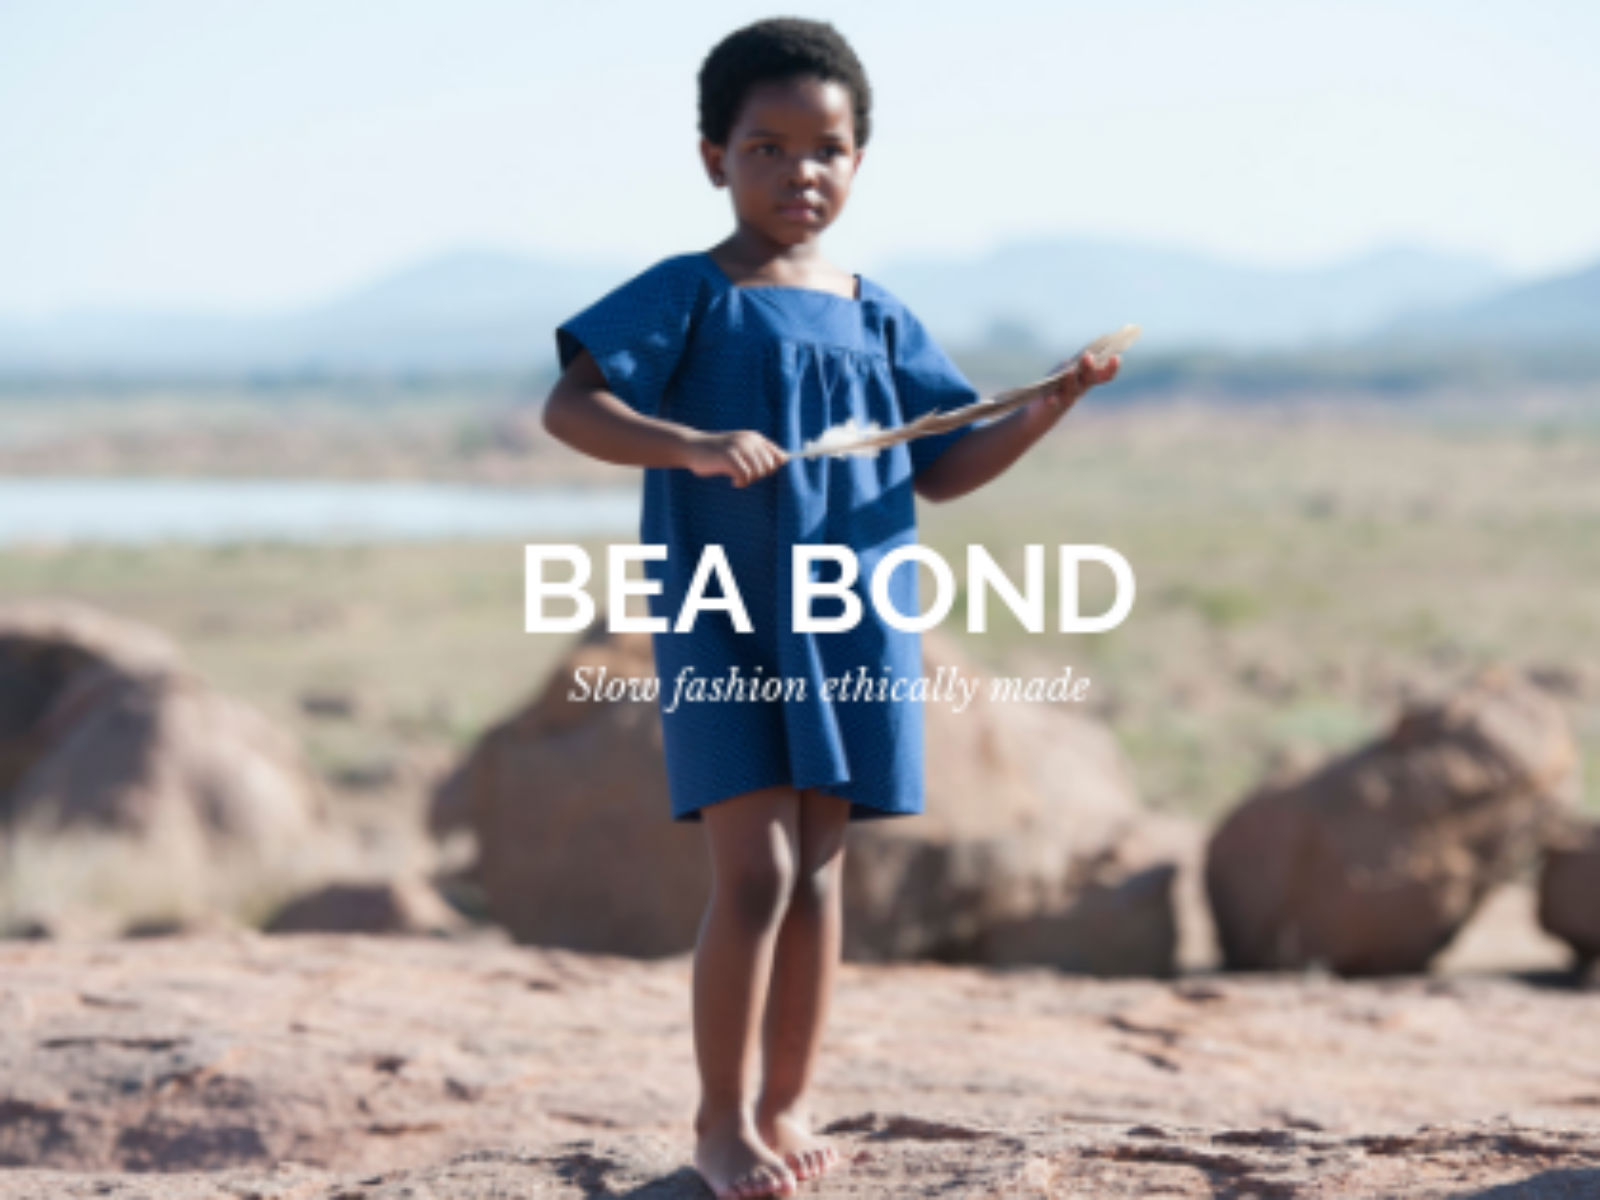 Bea Bond